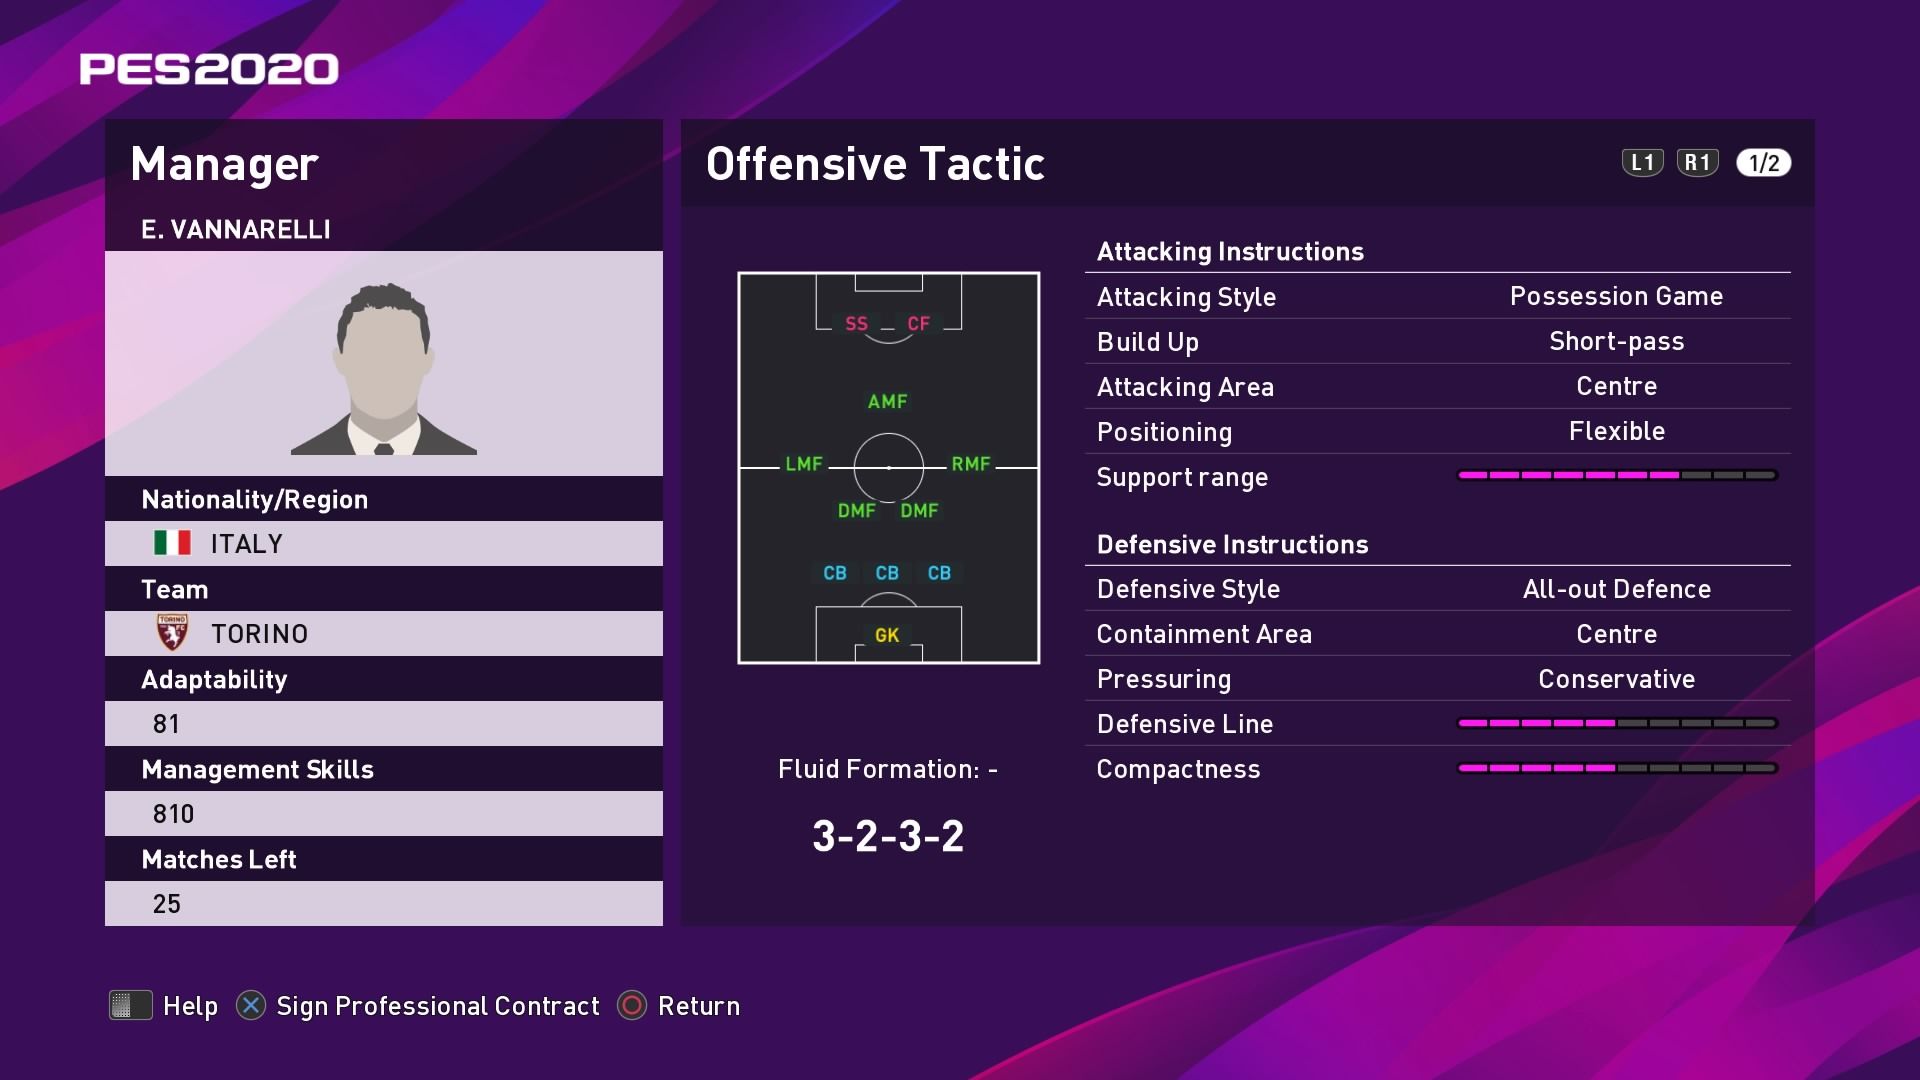 E. Vannarelli (Walter Mazzarri) Offensive Tactic in PES 2020 myClub